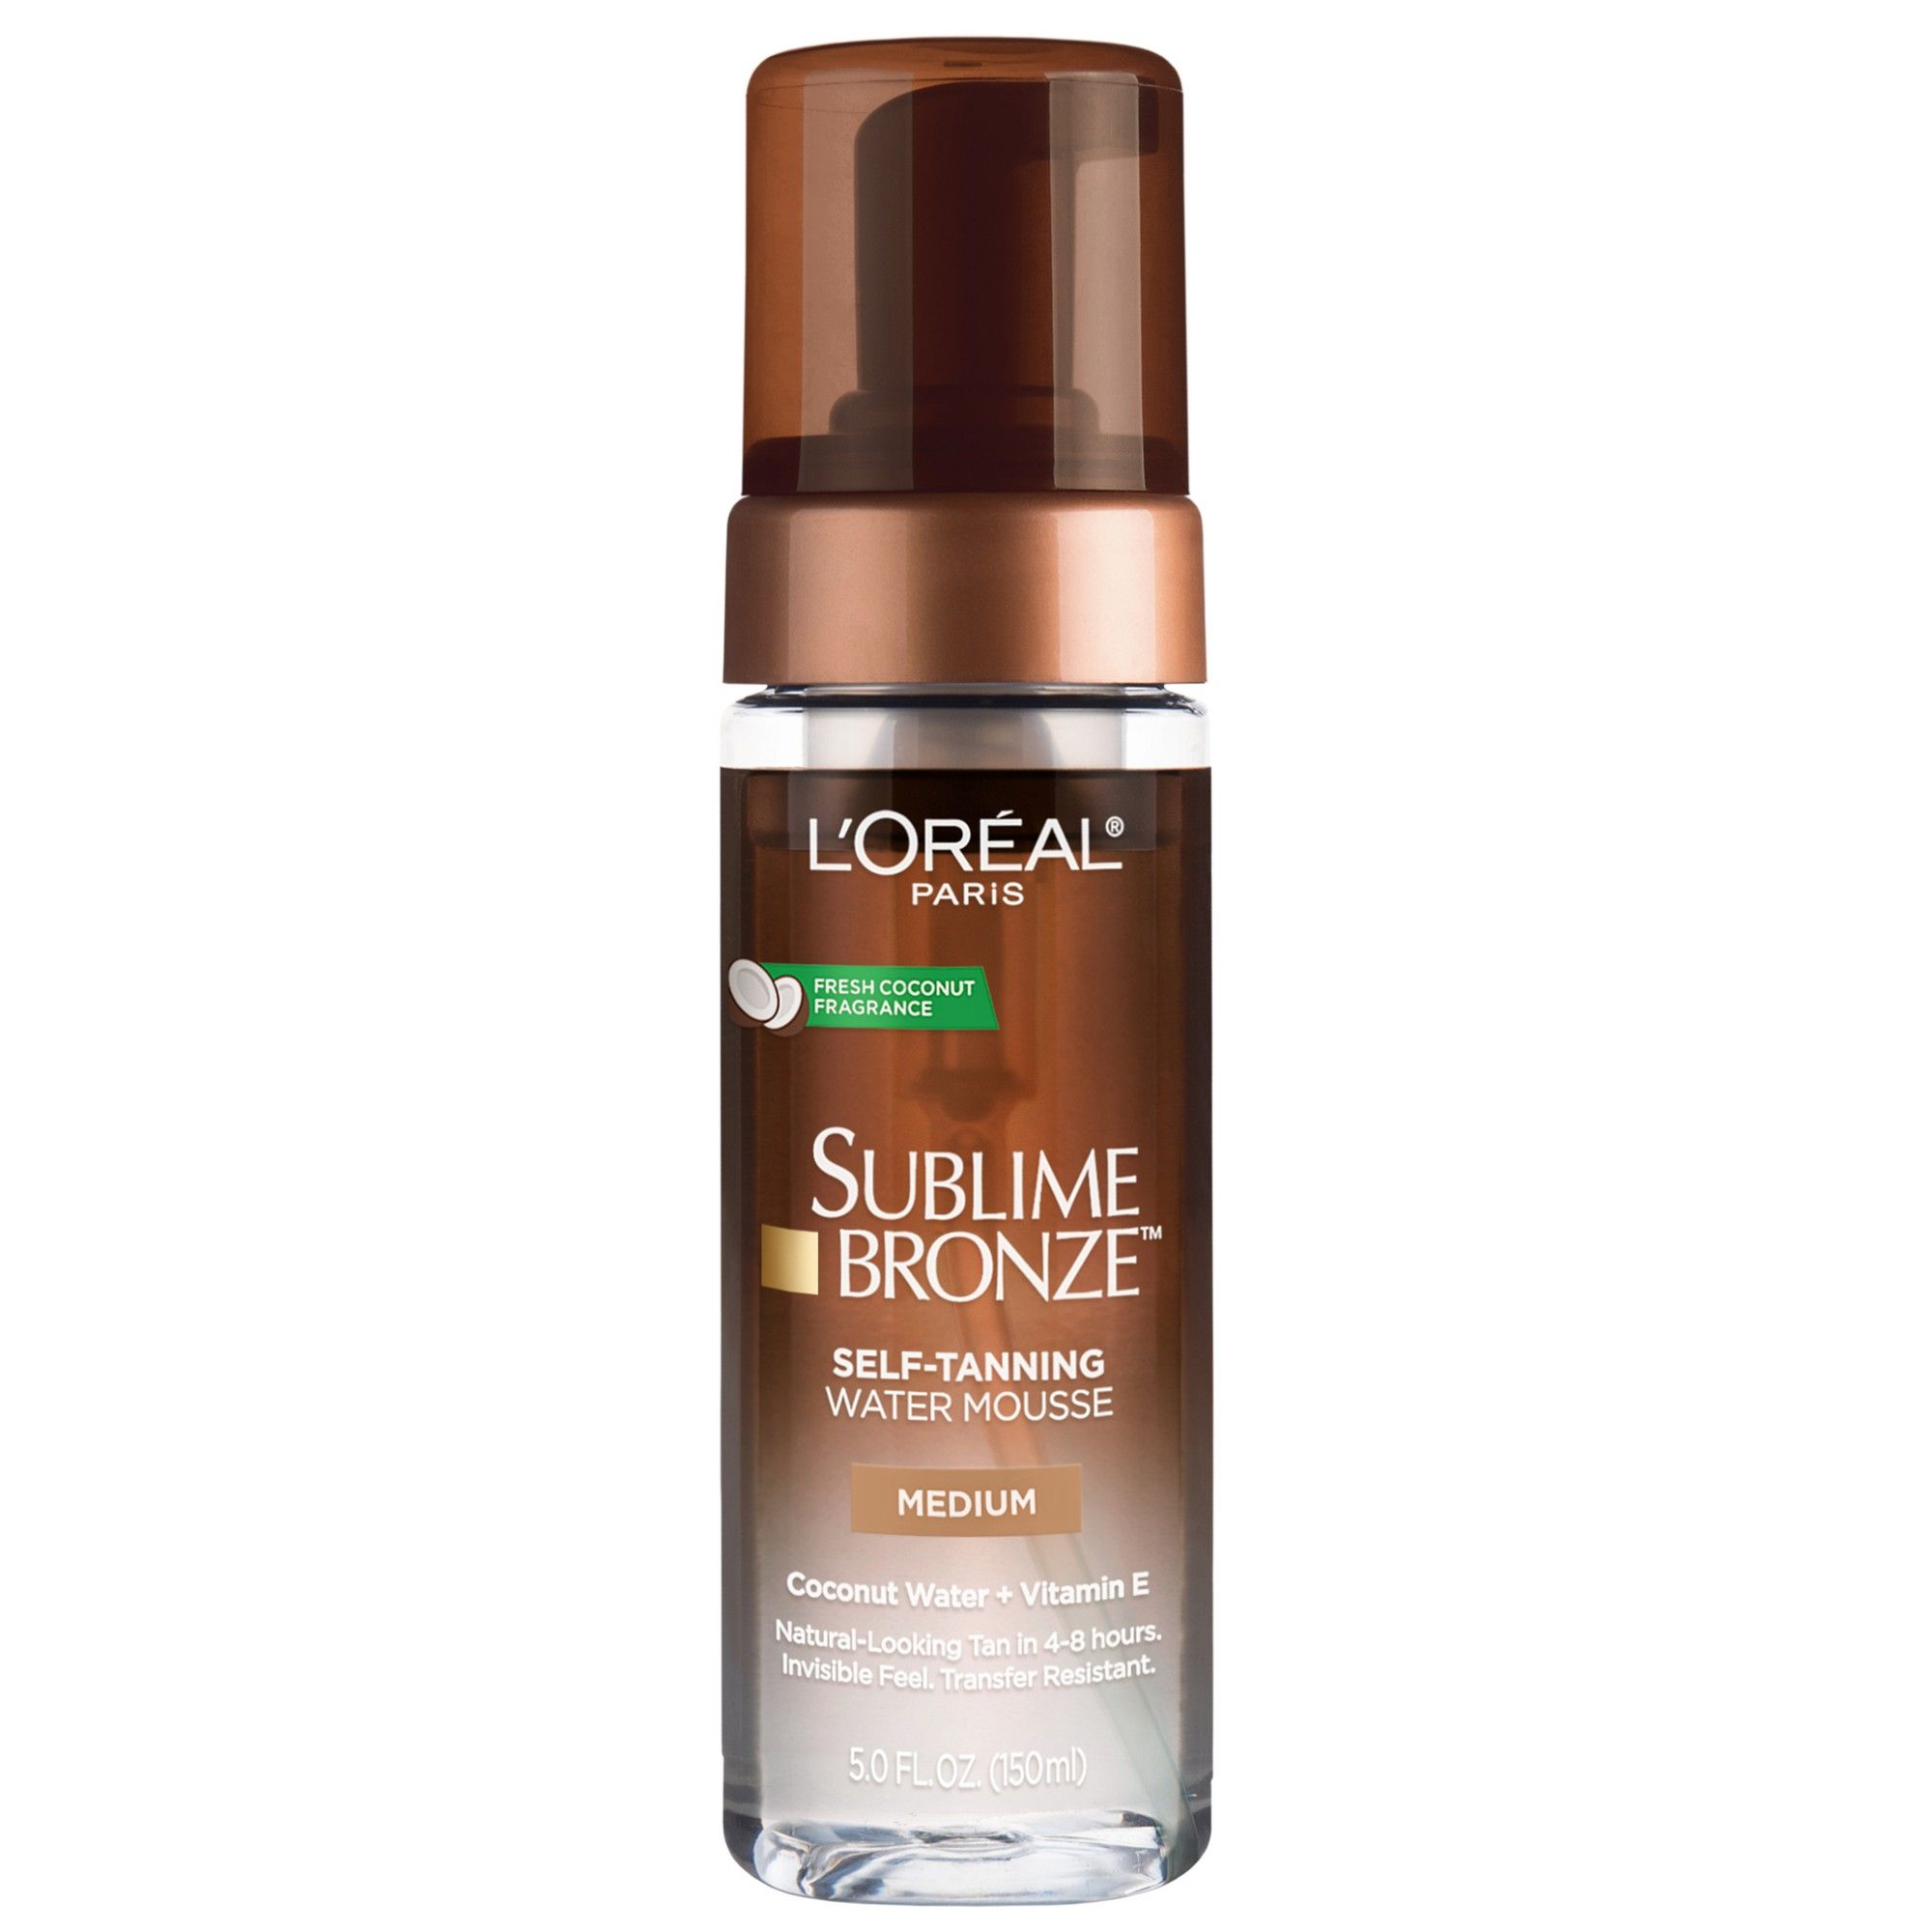 L'Oreal Paris Sunless Tanning Treatments 5 fl oz in 2019